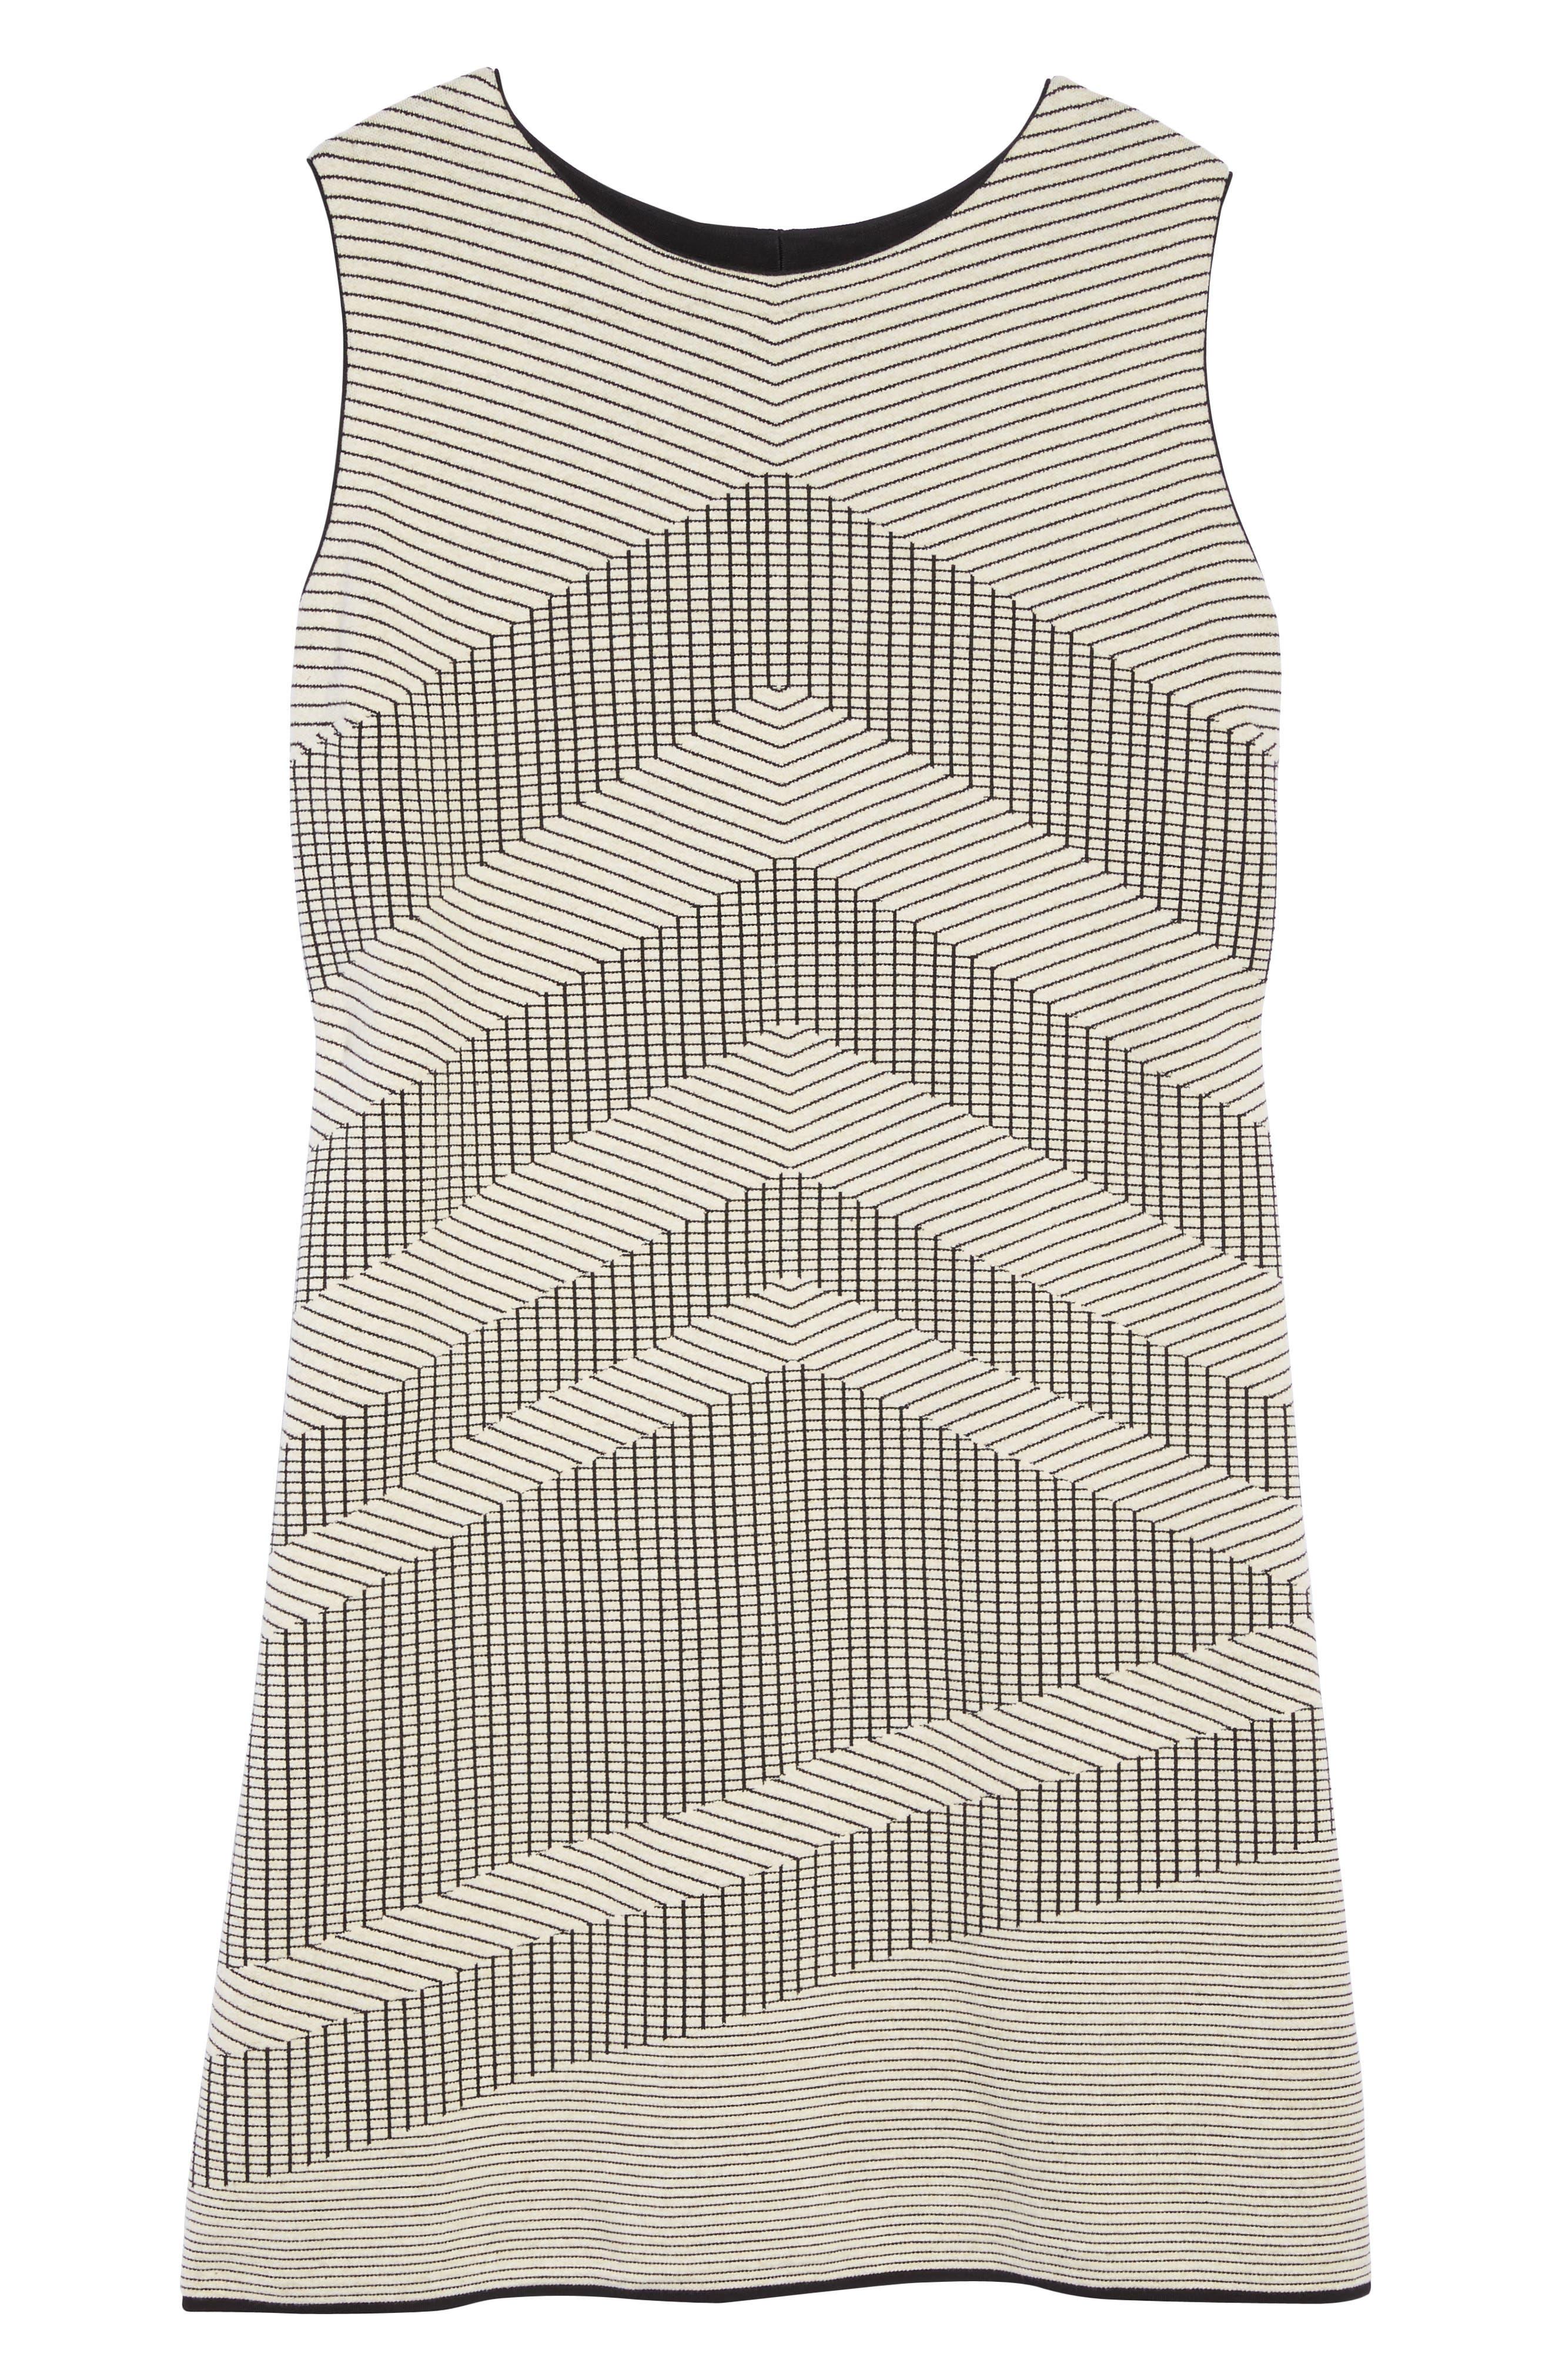 Mantra Chevron Stripe Knit Sheath Dress,                             Alternate thumbnail 6, color,                             Creme Brulee